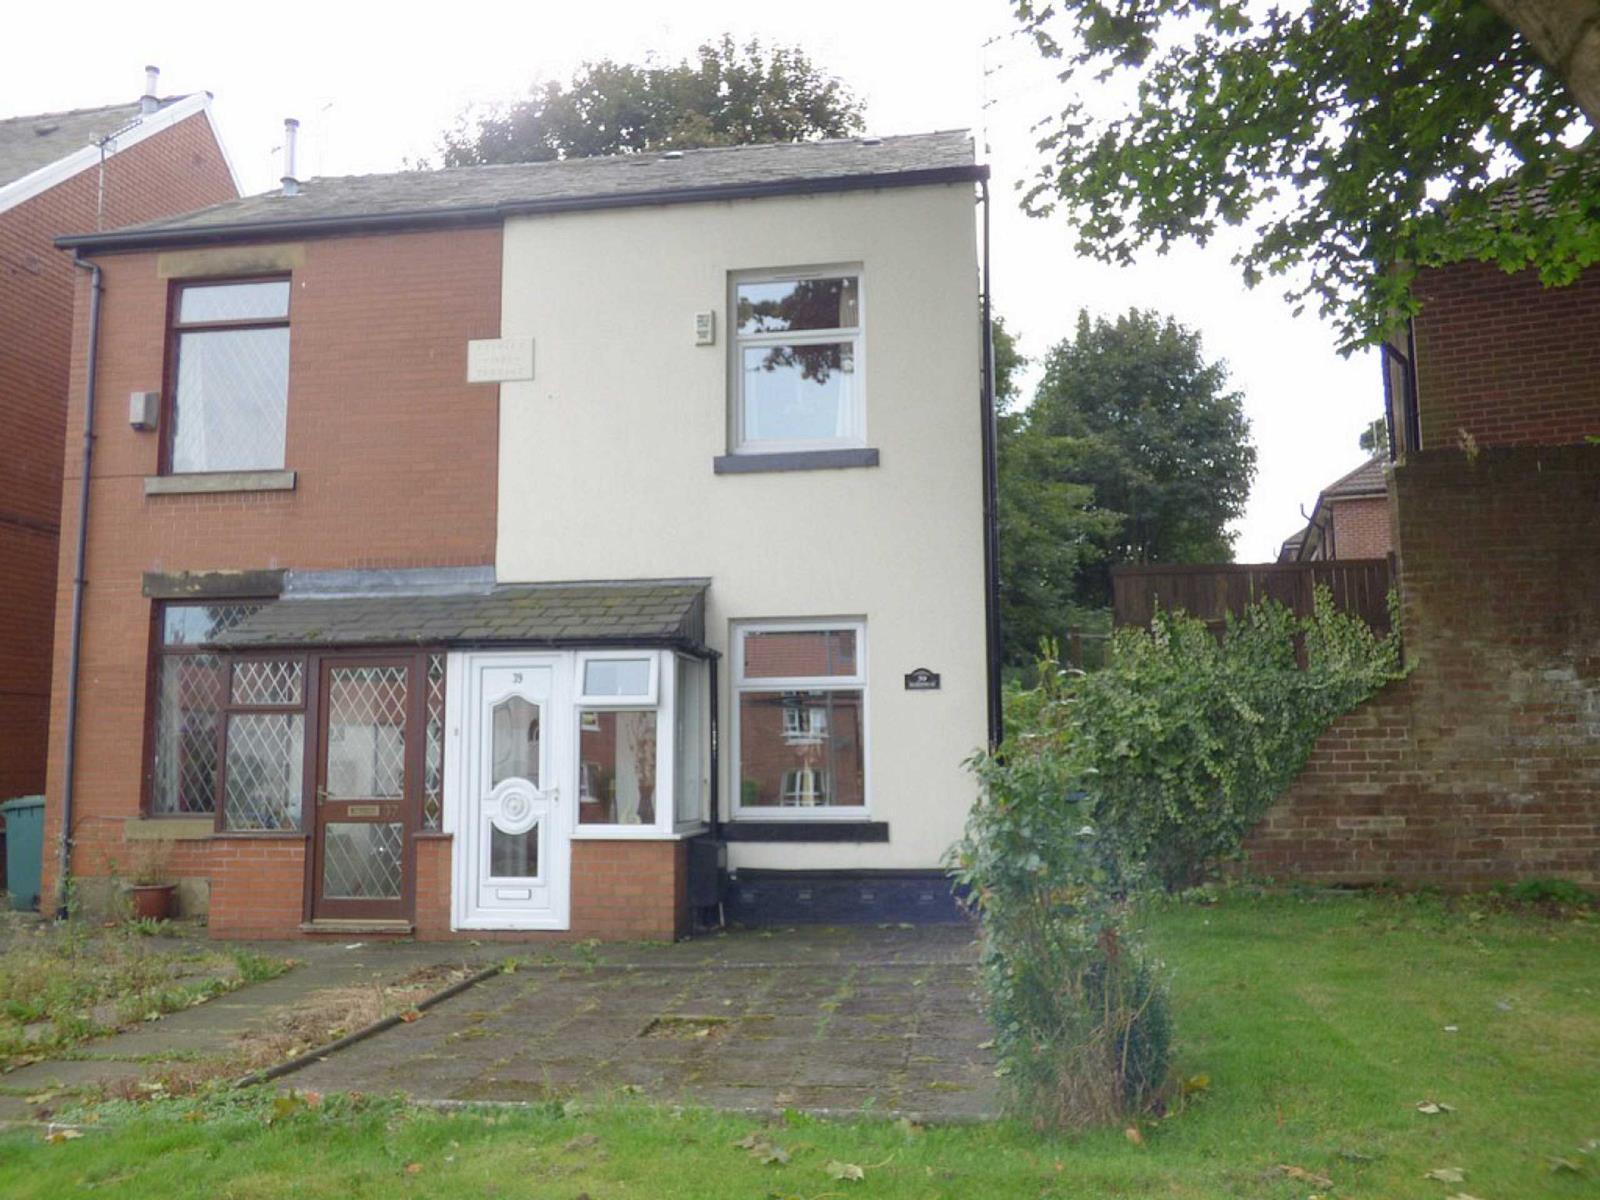 2 Bedrooms Semi Detached House for sale in Balderstone Road, Rochdale, Lancashire, OL11